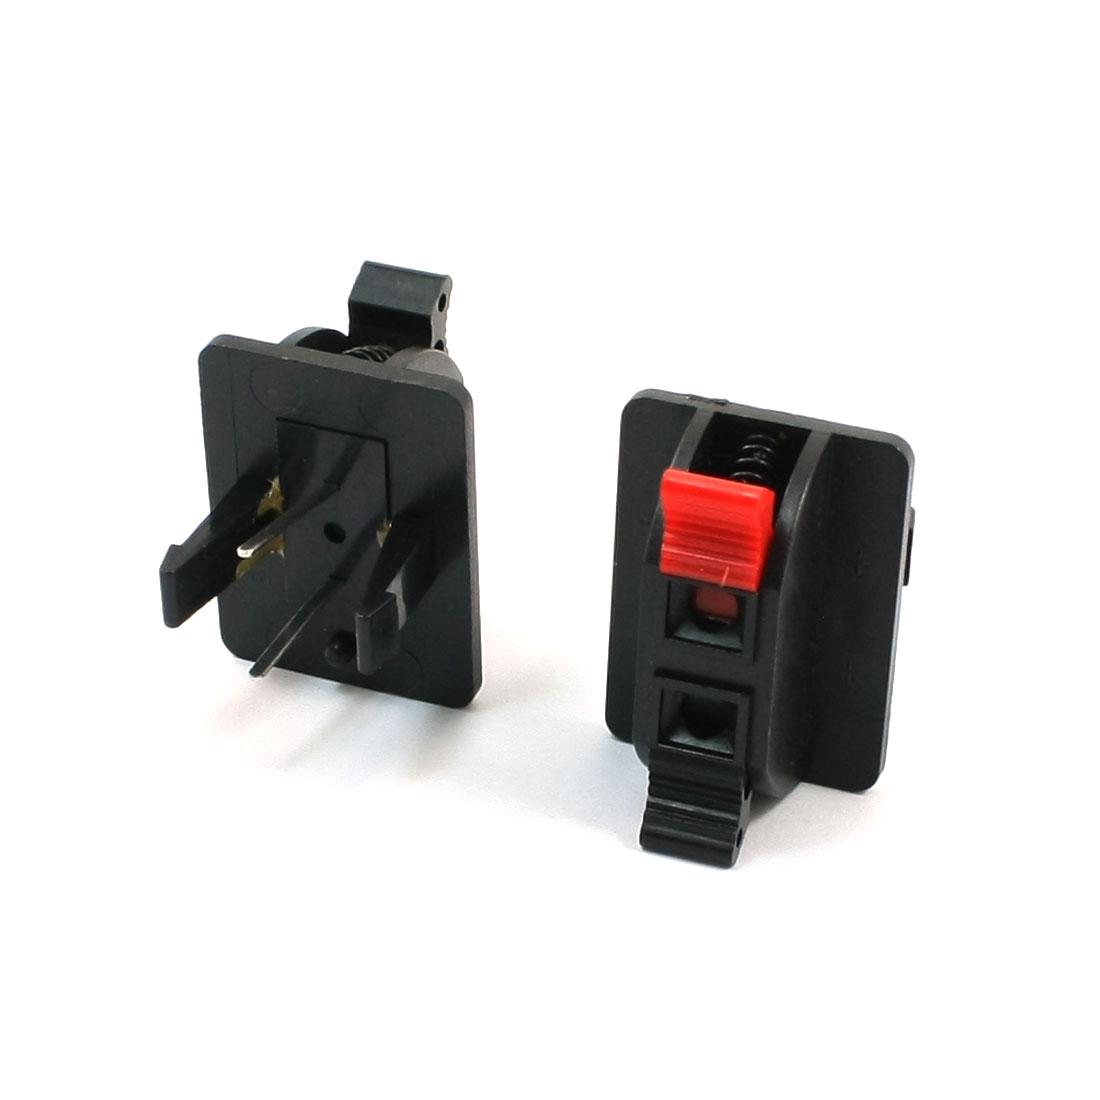 2pcs Red Black Push Type 2 Positon Speaker Terminal Connector 2 Terminal 40 x 30mm